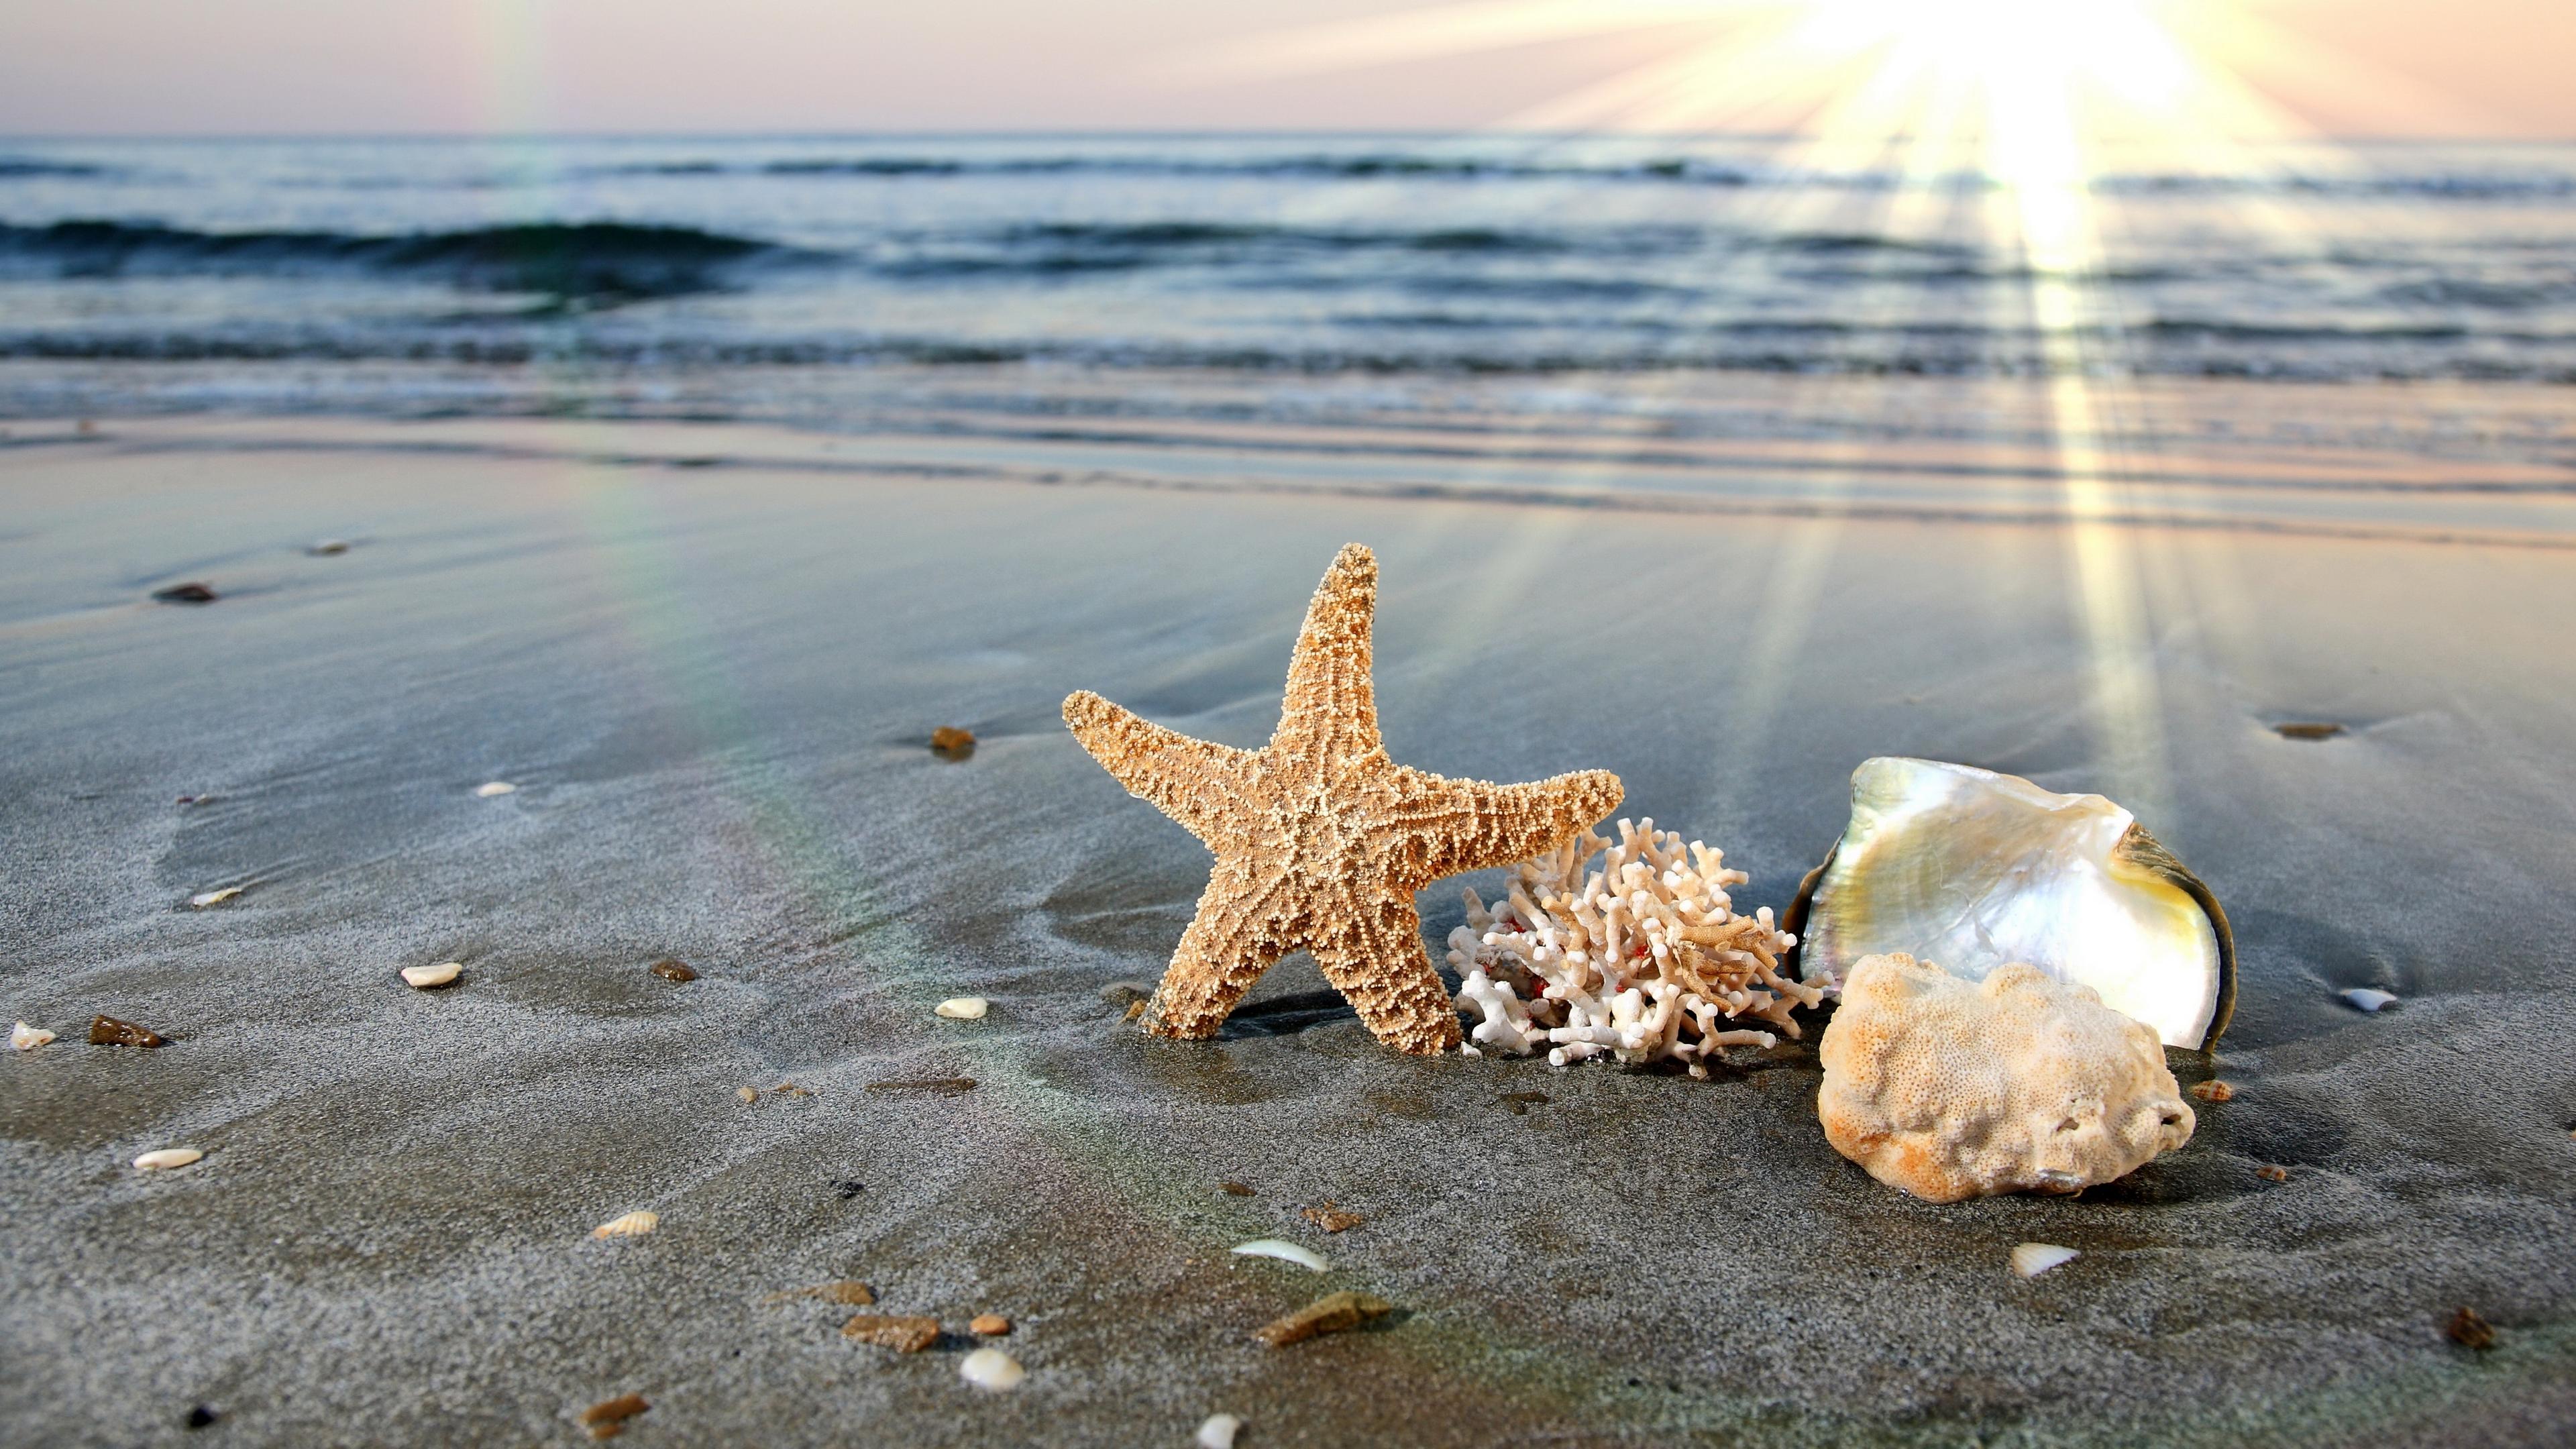 природа горизонт море морская звезда без смс